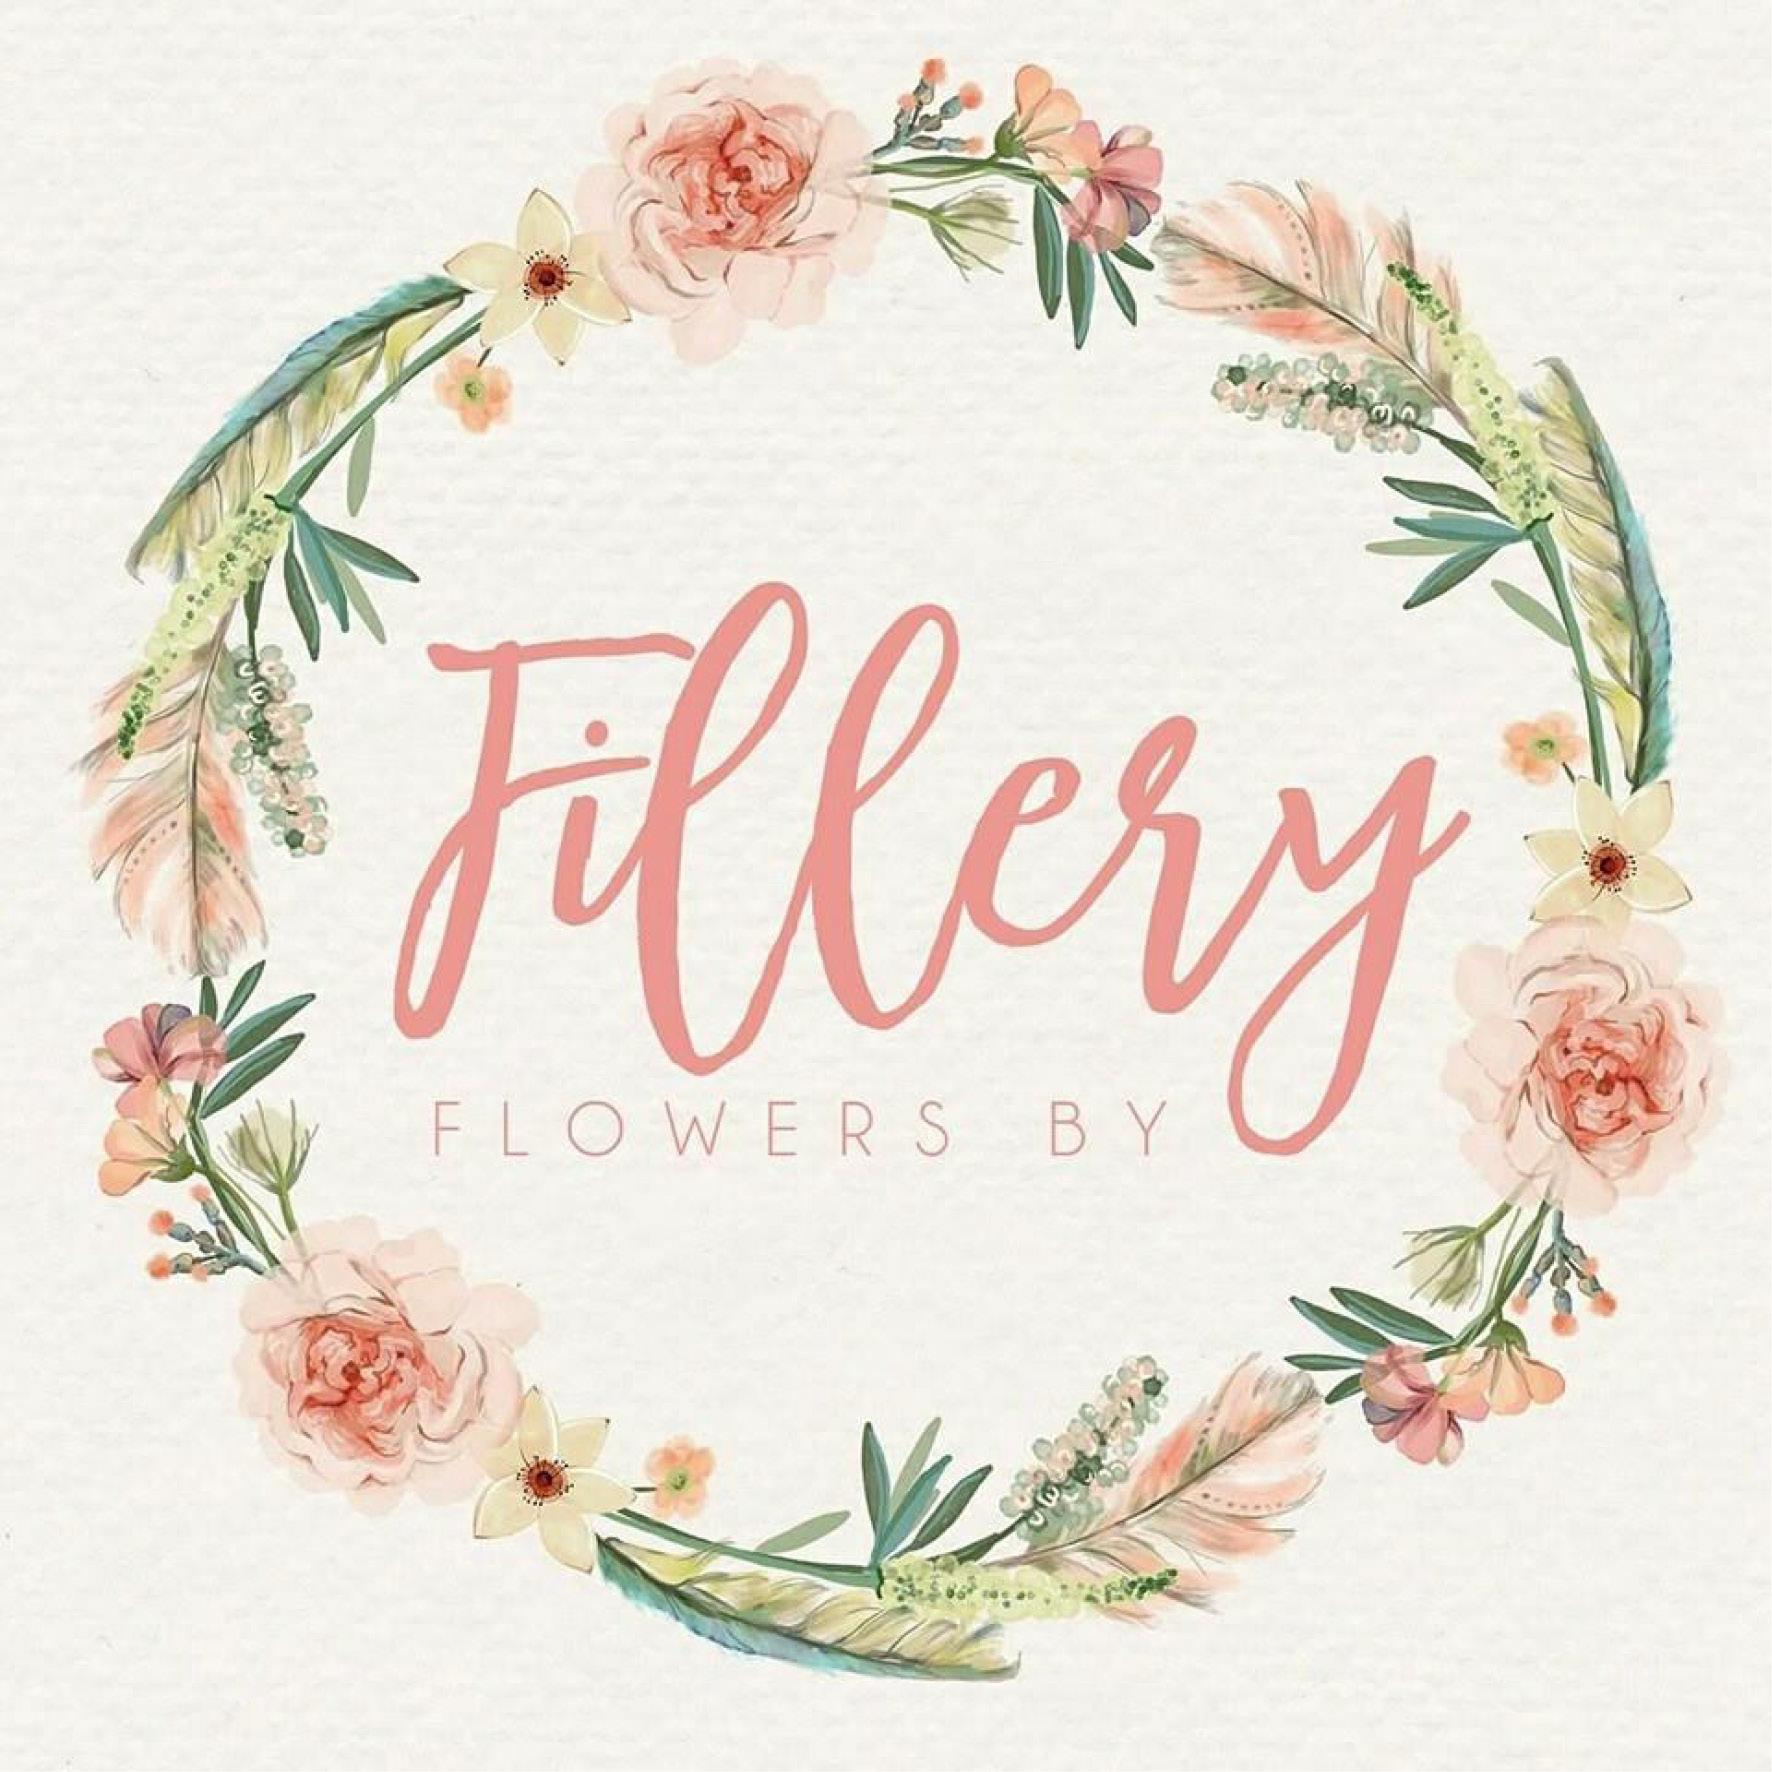 flowers by fillery